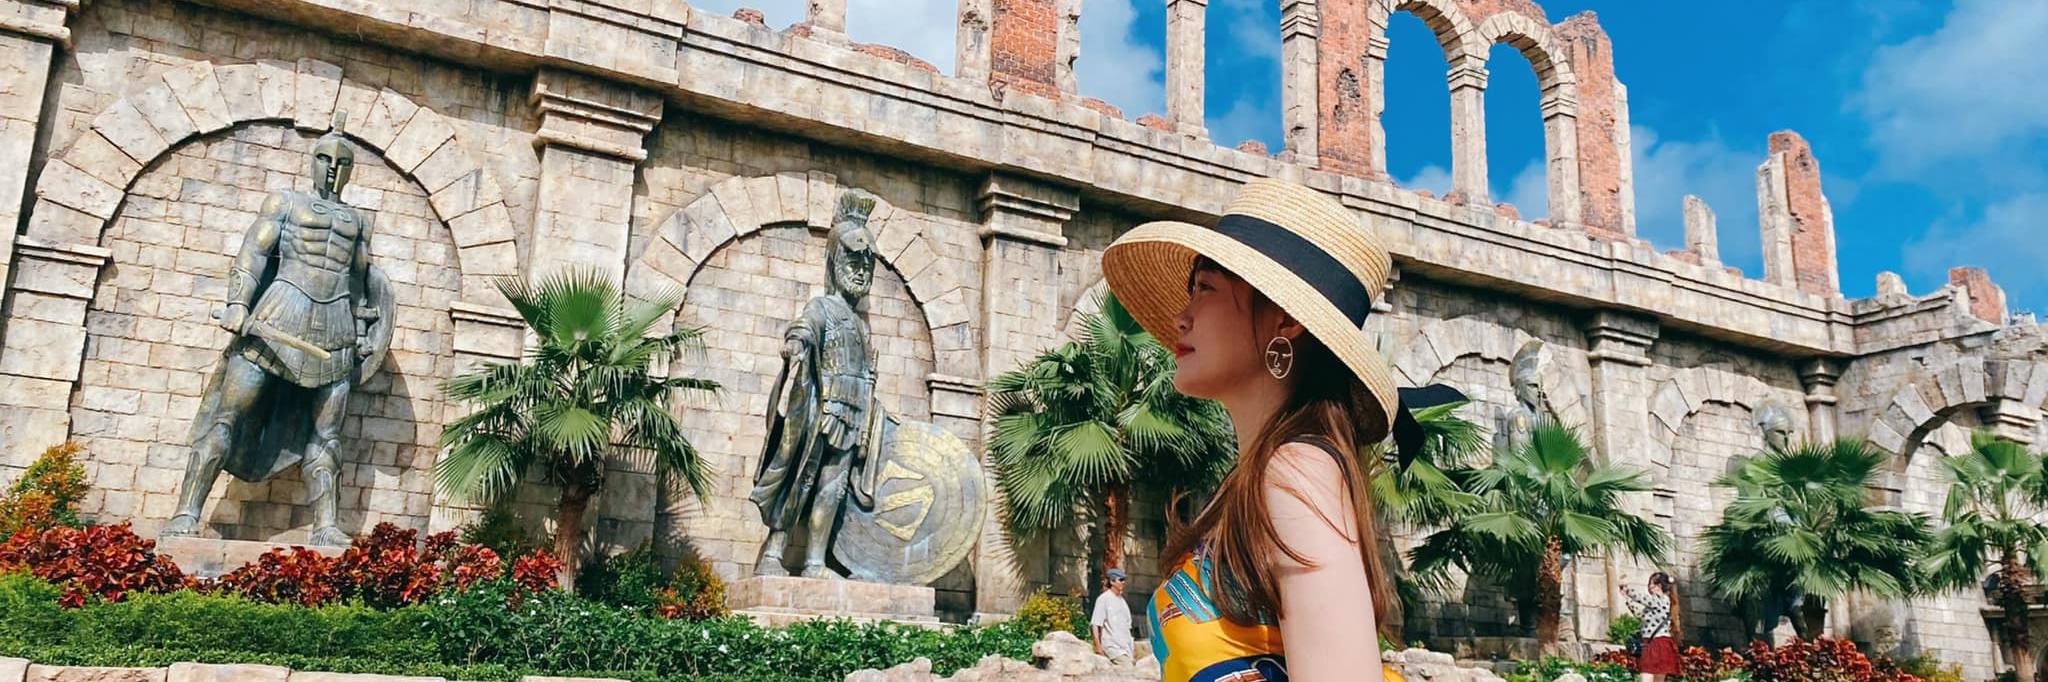 https://gody.vn/blog/thanhngoc6146/post/check-in-2-dau-truong-la-ma-phien-ban-viet-nam-dep-nhu-o-troi-au-8775